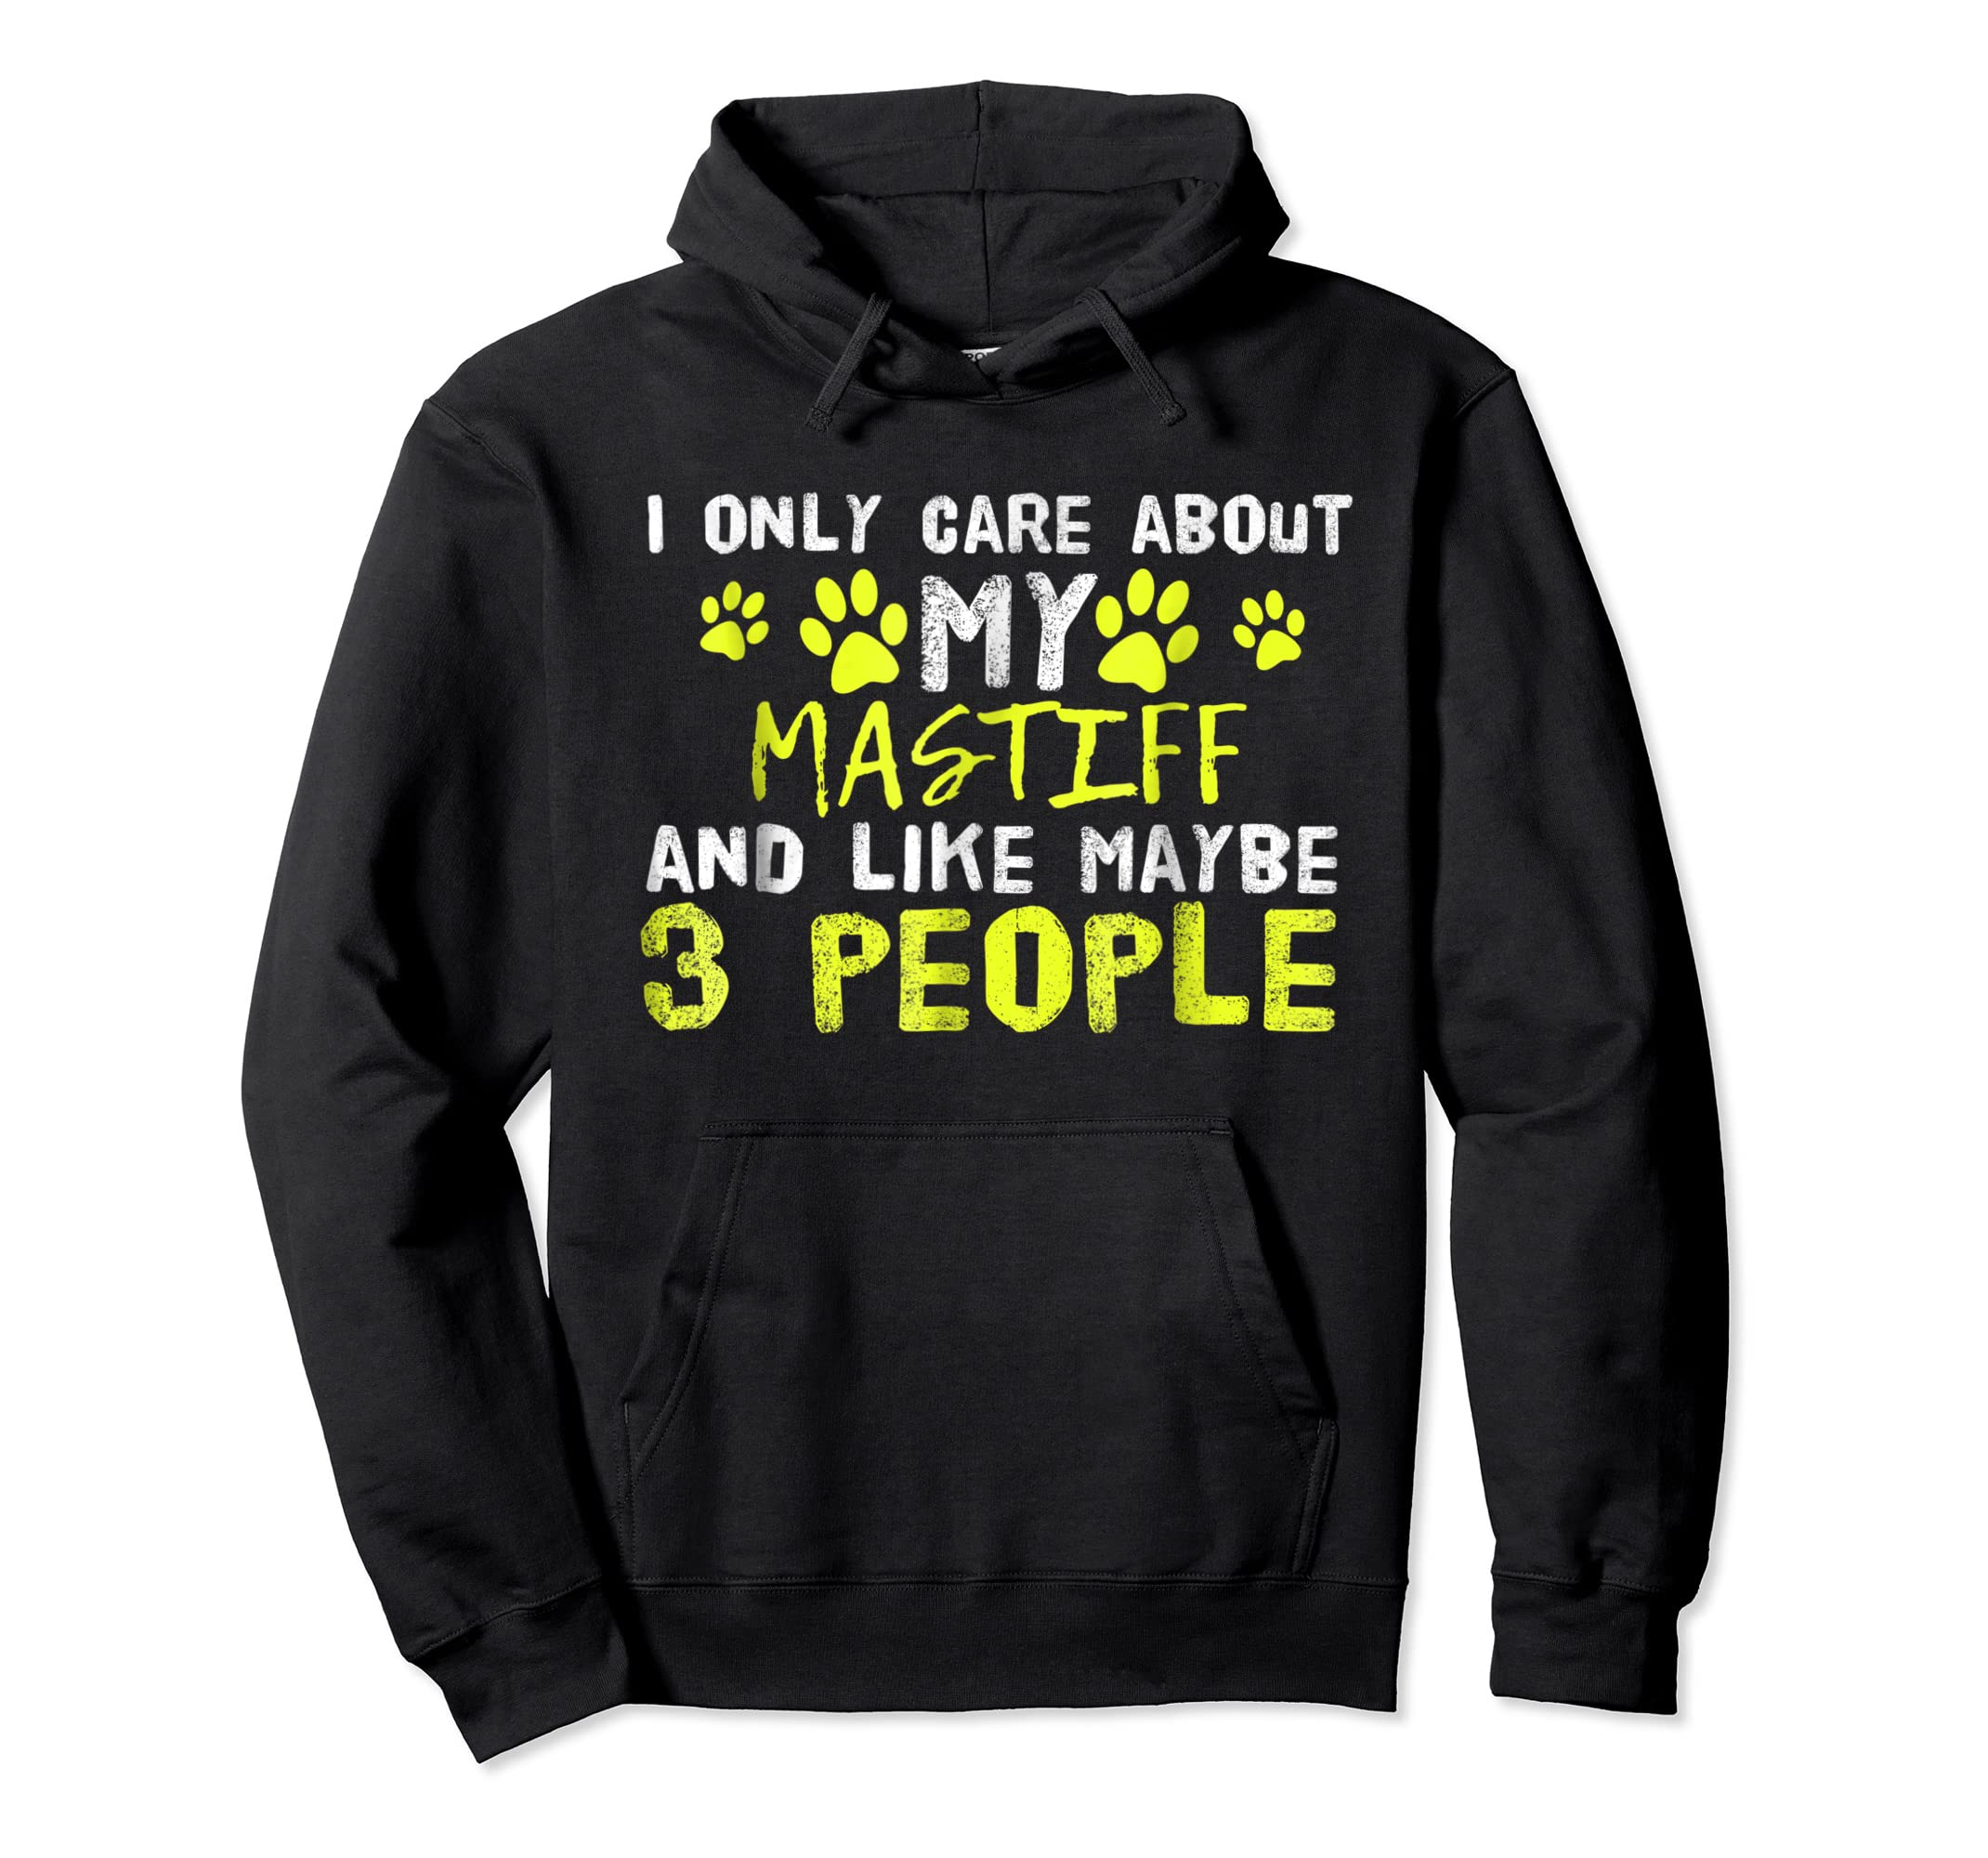 Mastiff Dog Shirt Introvert Love My Dog Tee-Hoodie-Black